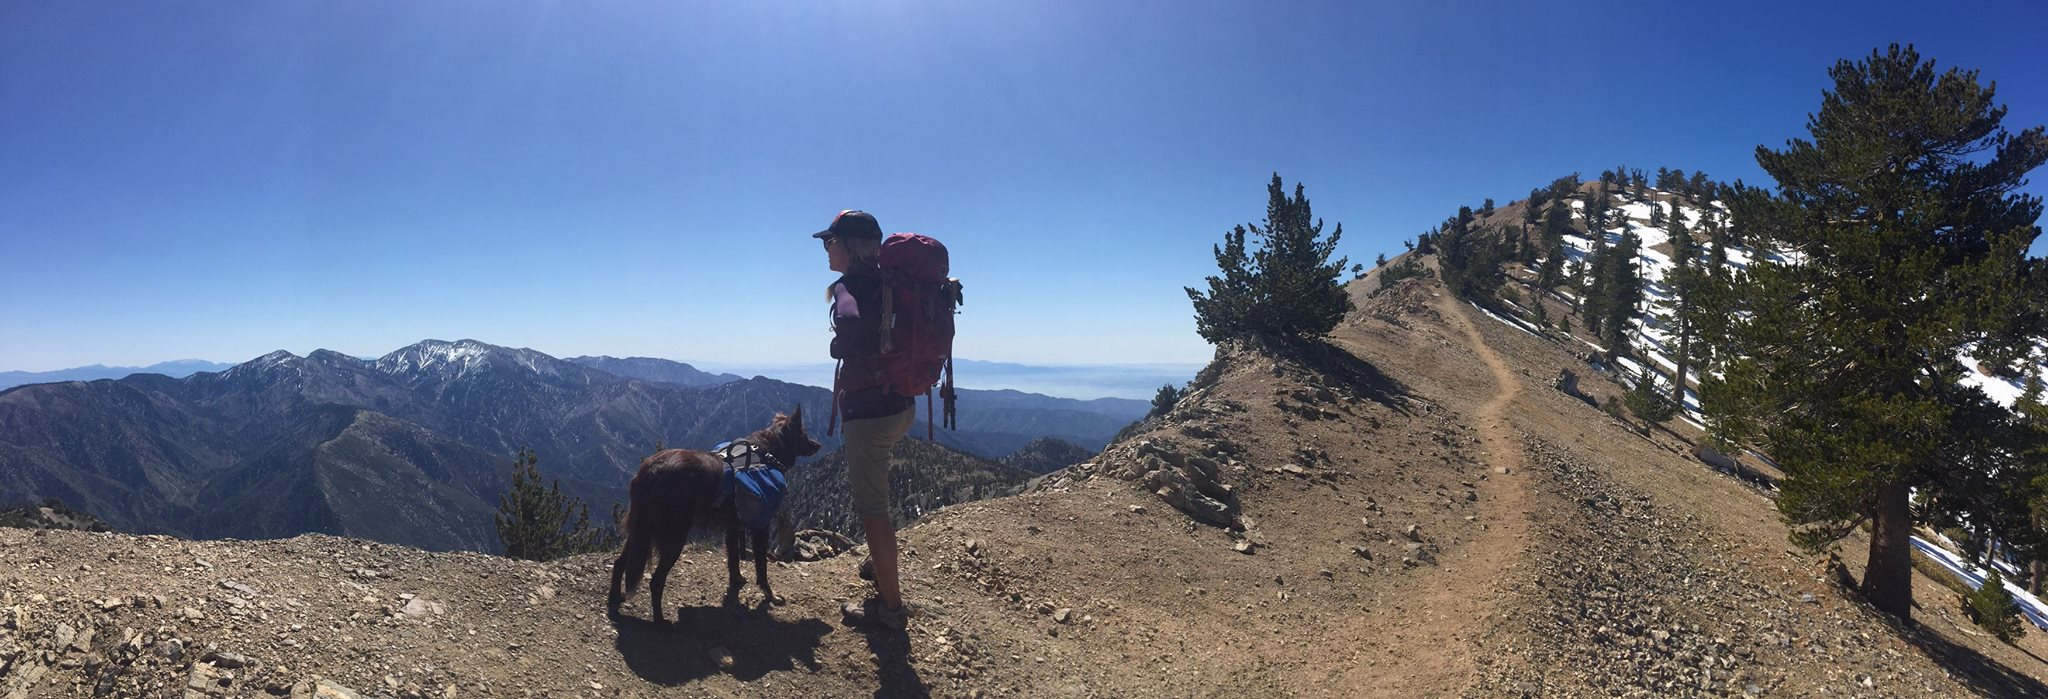 hiking this world exists thisworldexists madison dusseau mountains